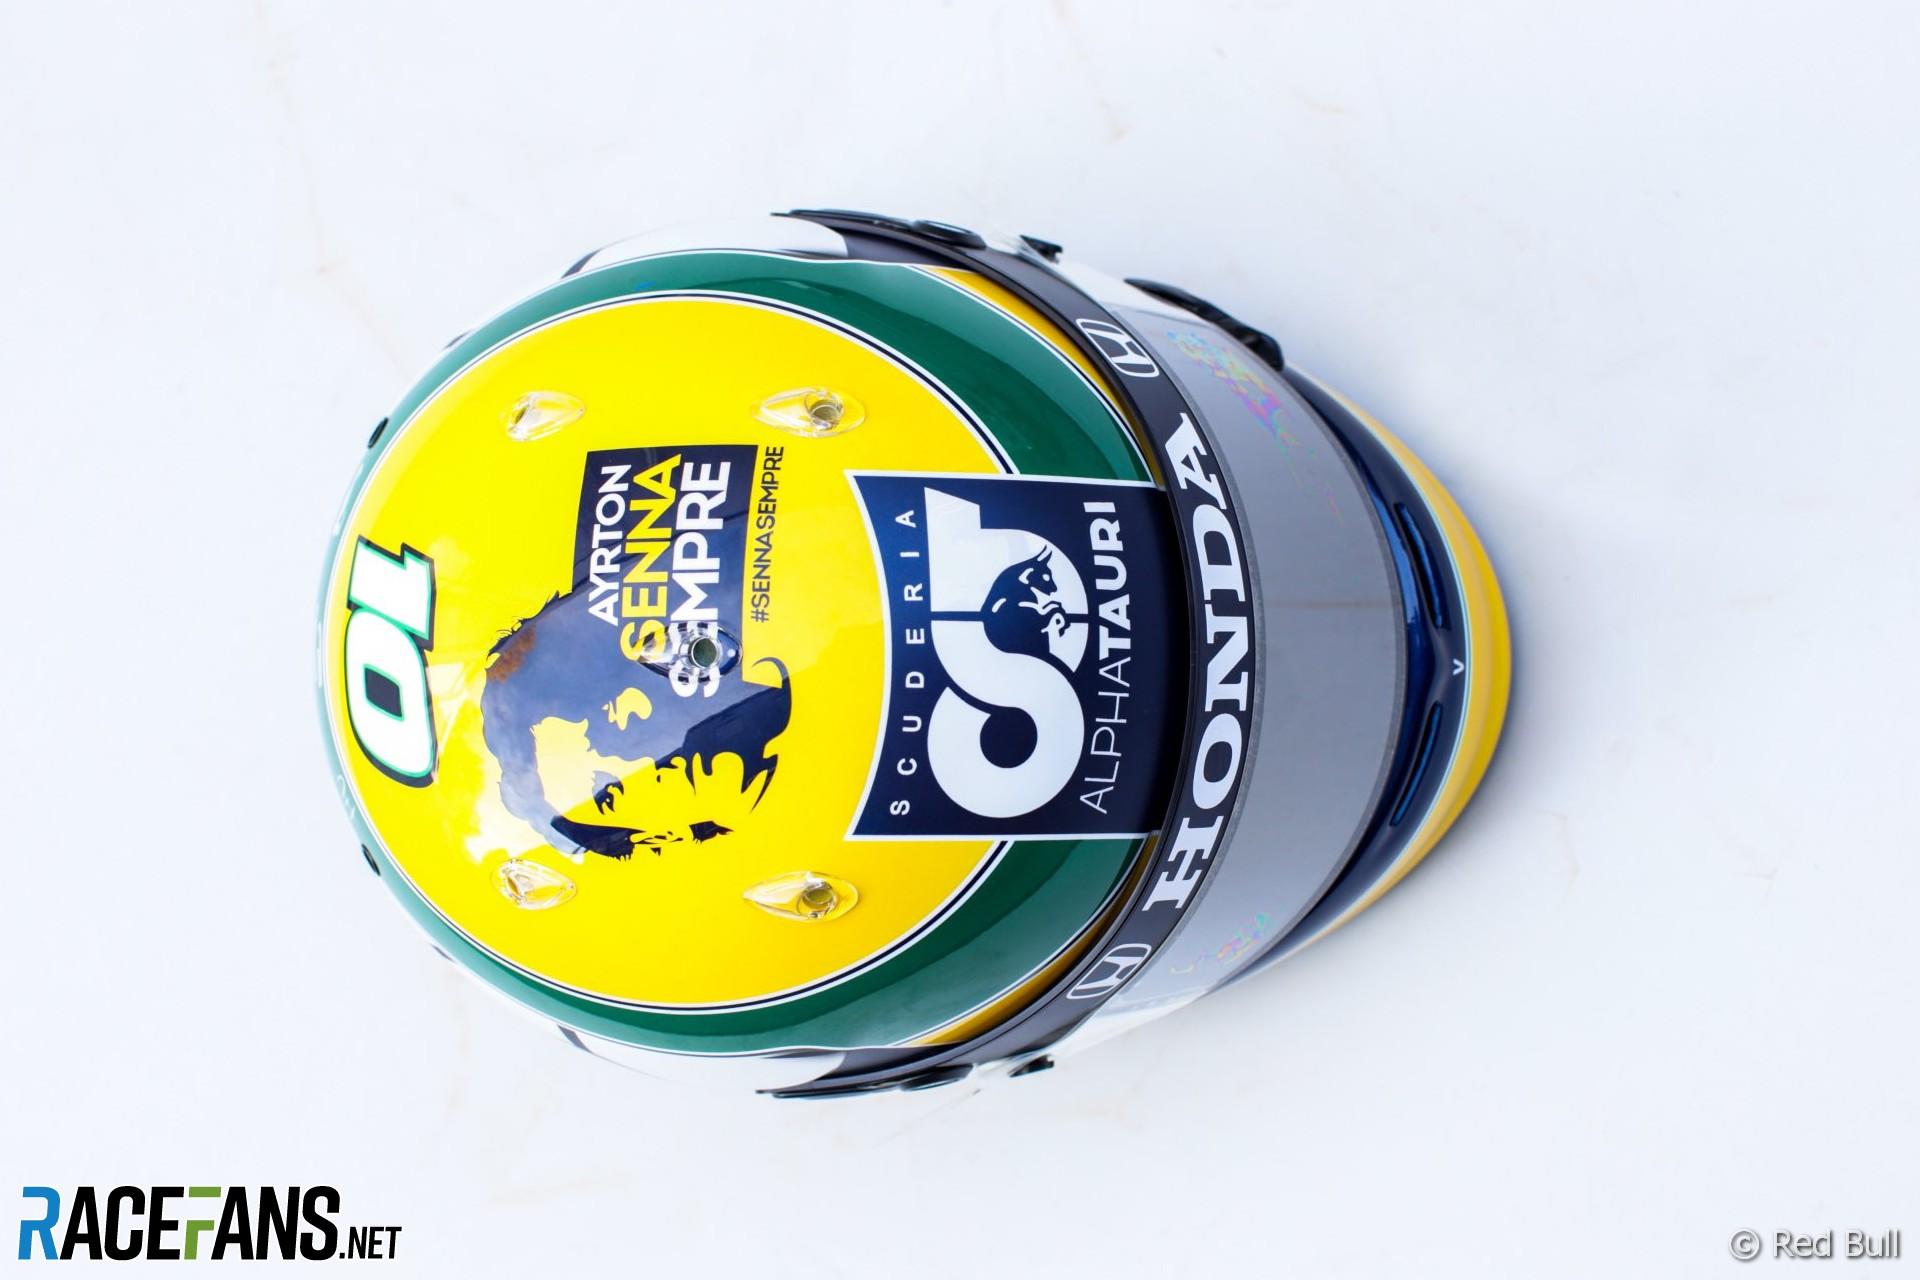 Pierre Gasly's Emilia-Romagna helmet, 2020